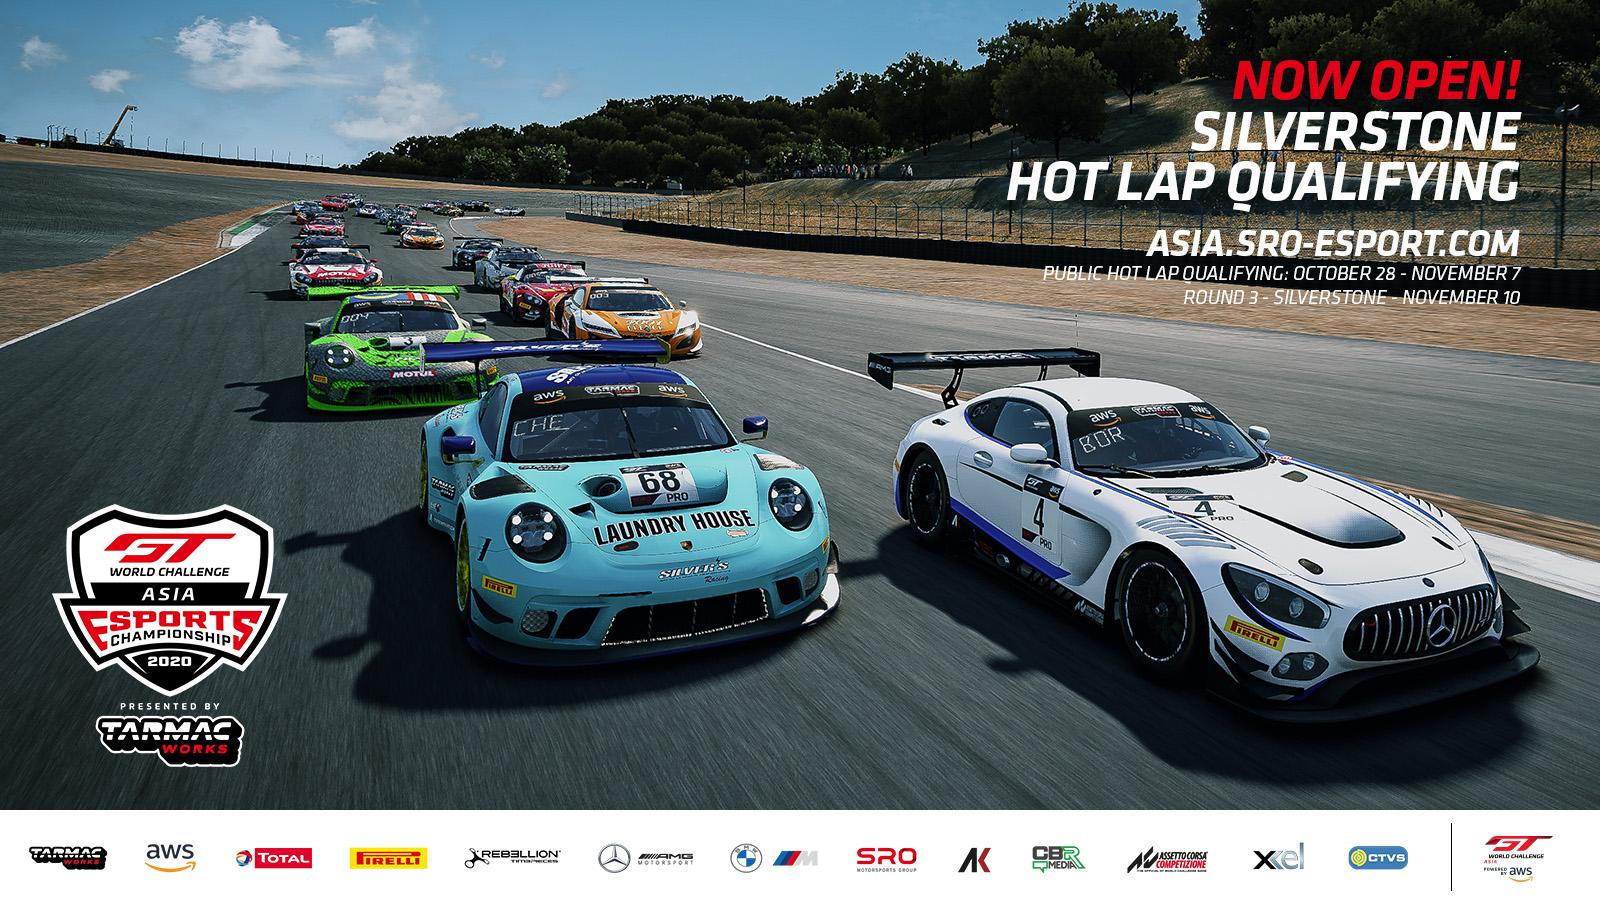 Esports: Silverstone public hot lap qualifying now open